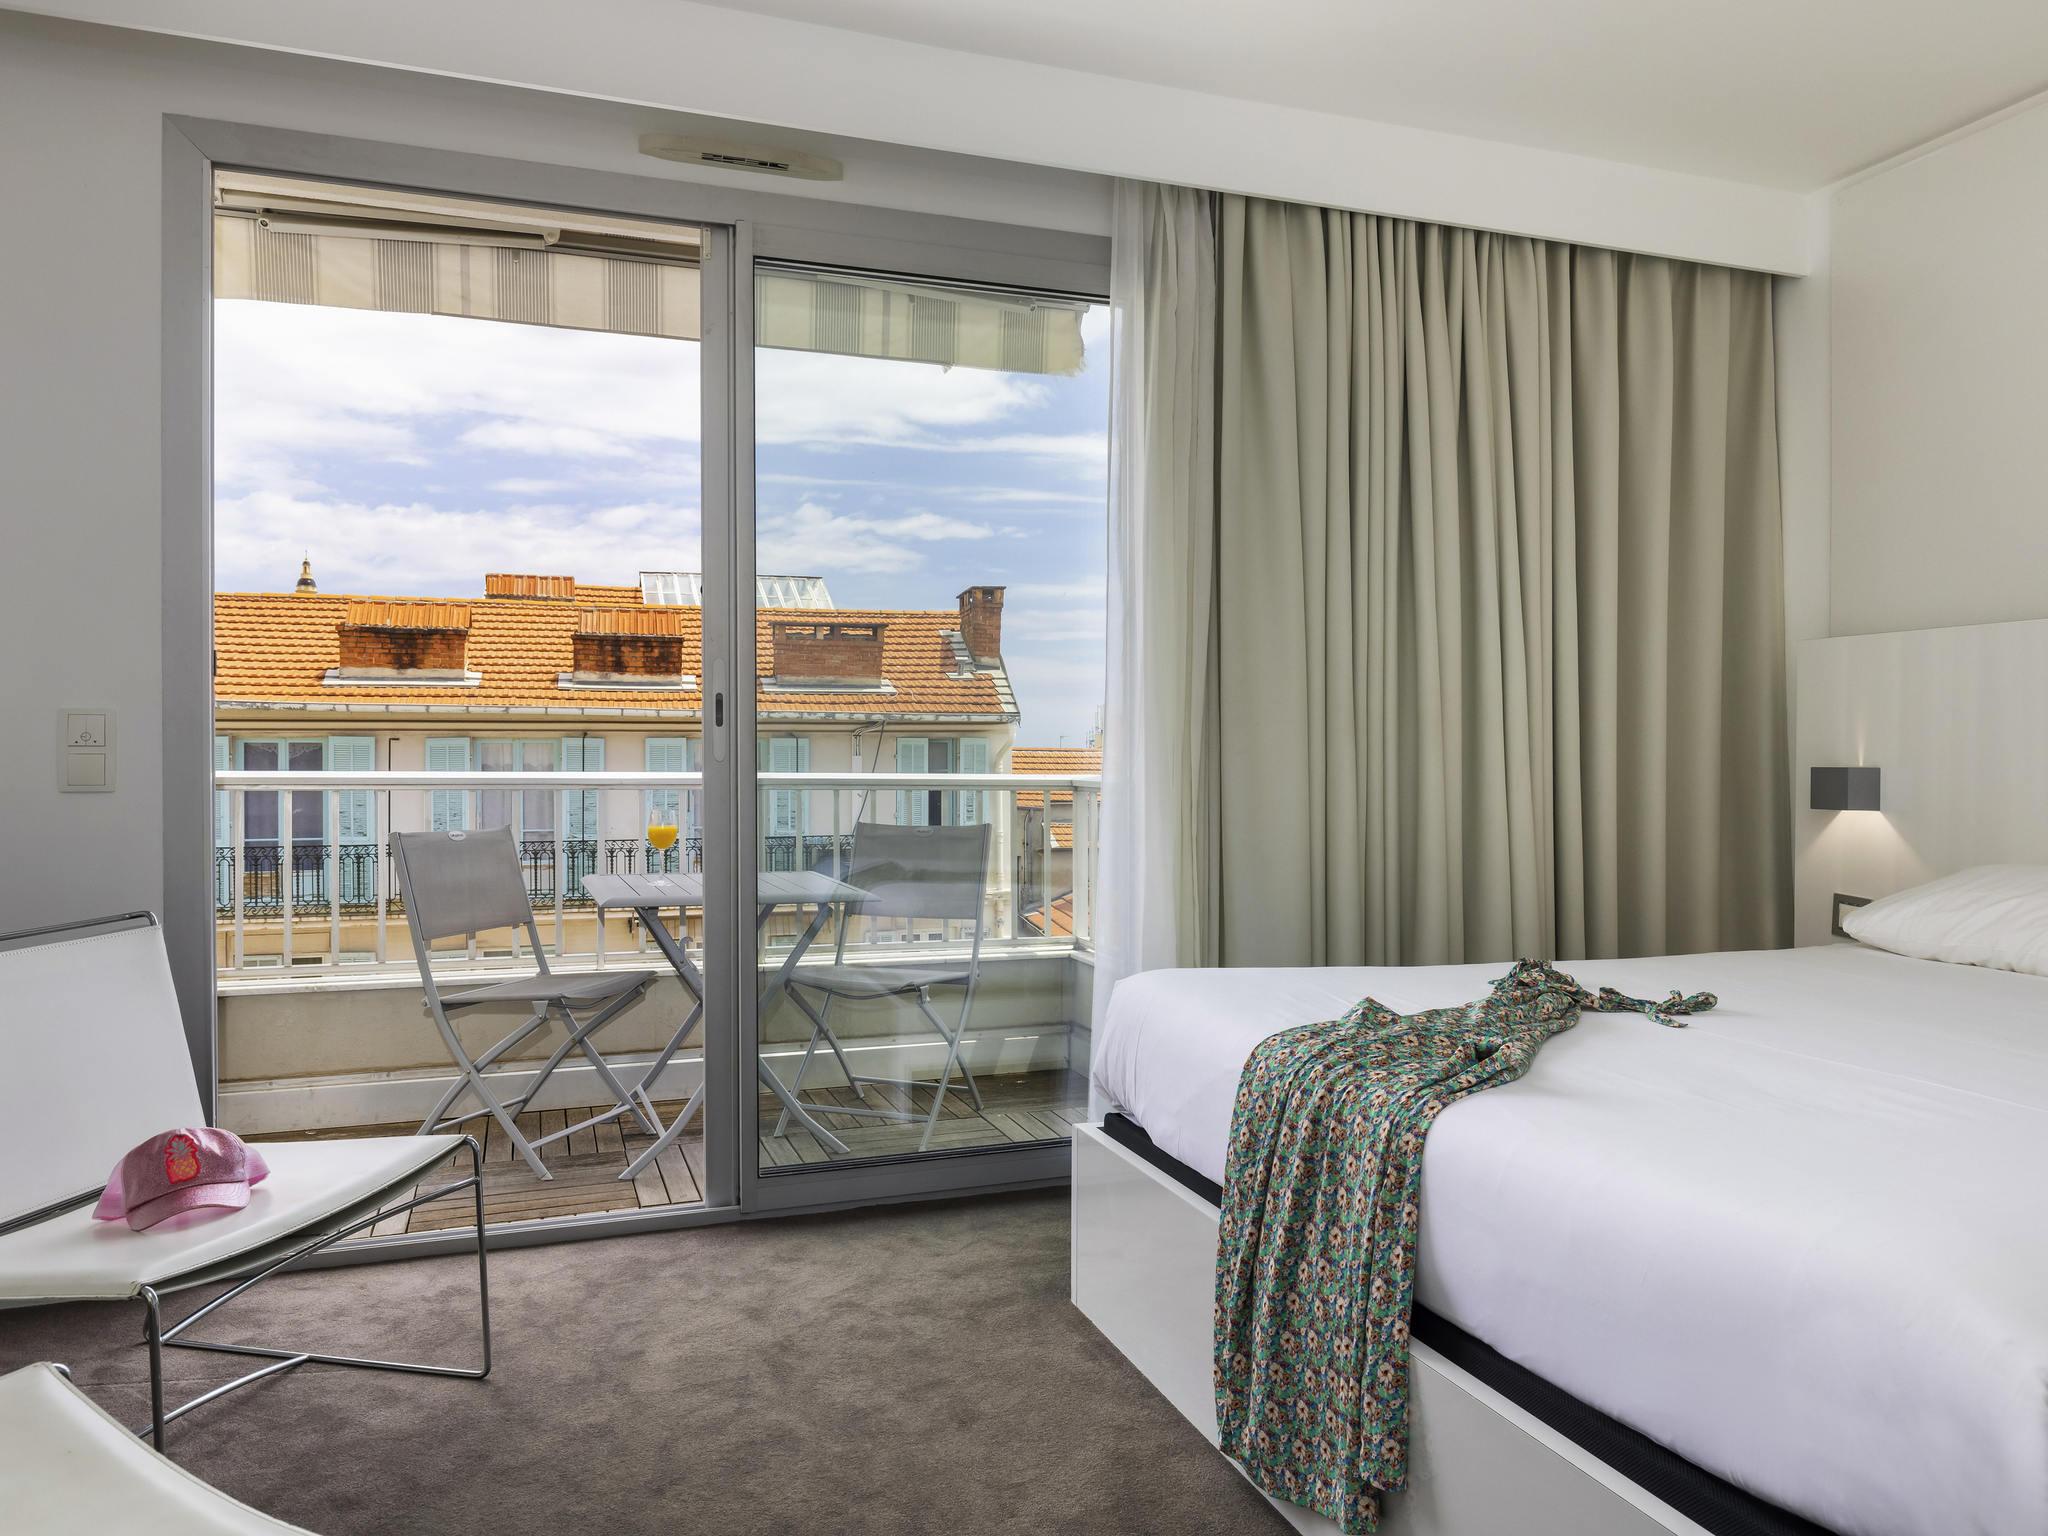 Hotel Ibis Styles Menton Centre